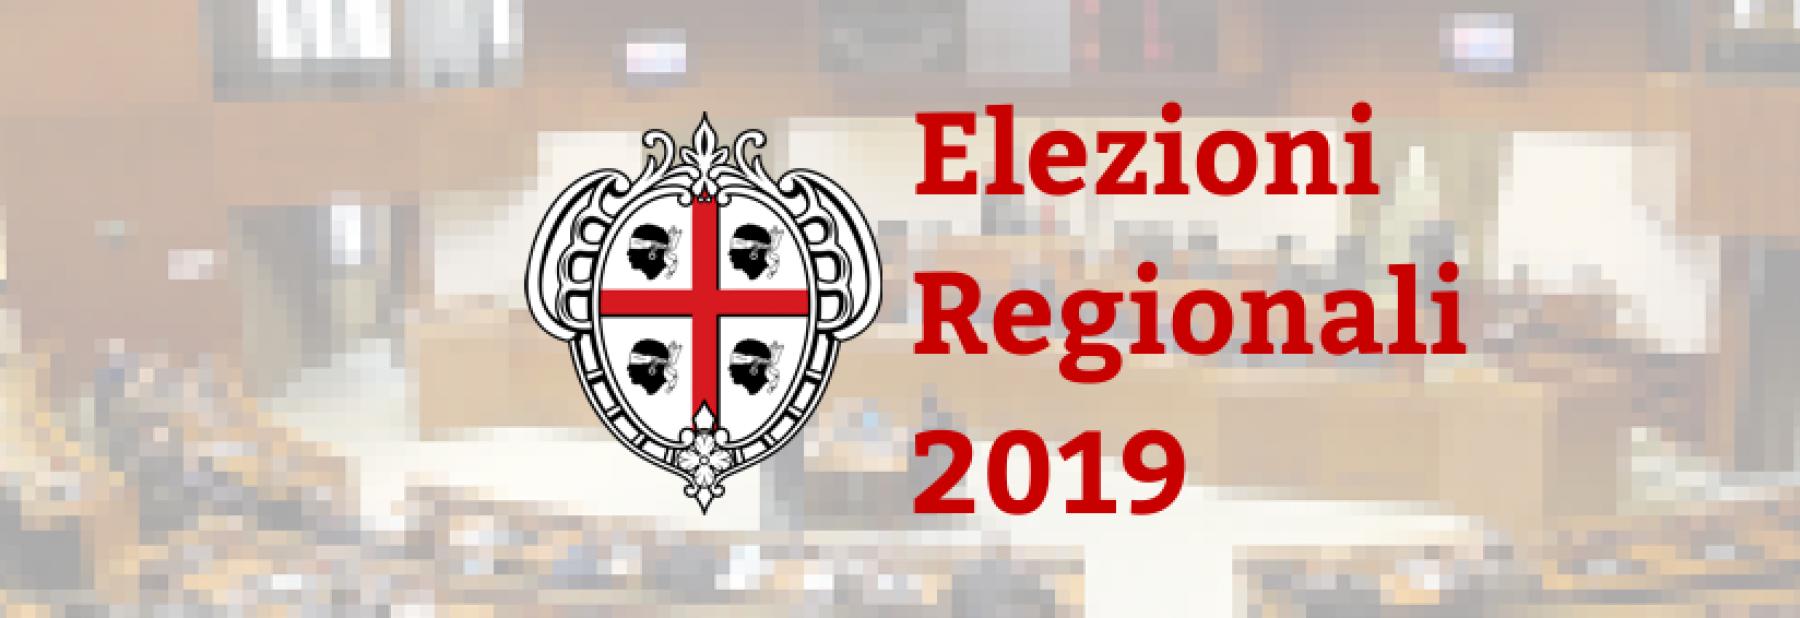 elezioni_regionali_2019